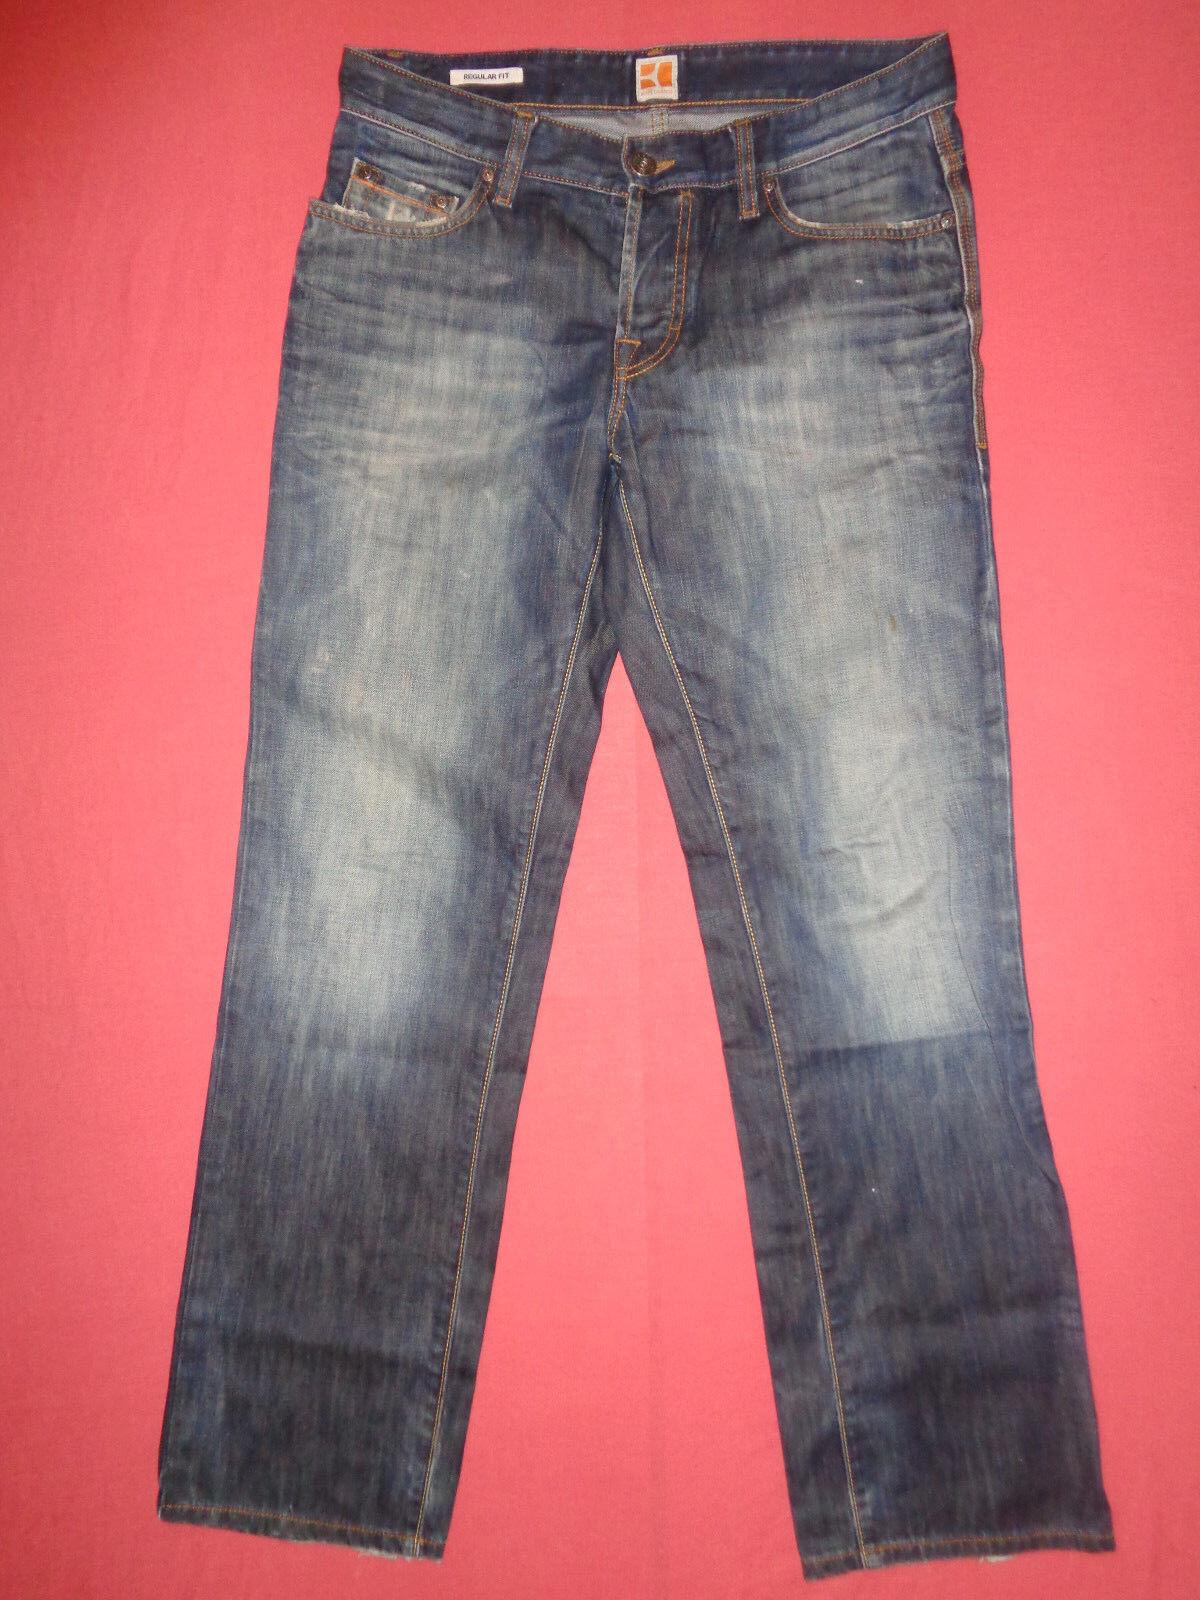 Designer Hugo Boss arancia-Jeans Denim Blu Da Uomo-Vita 32 Gamba 32-J 675